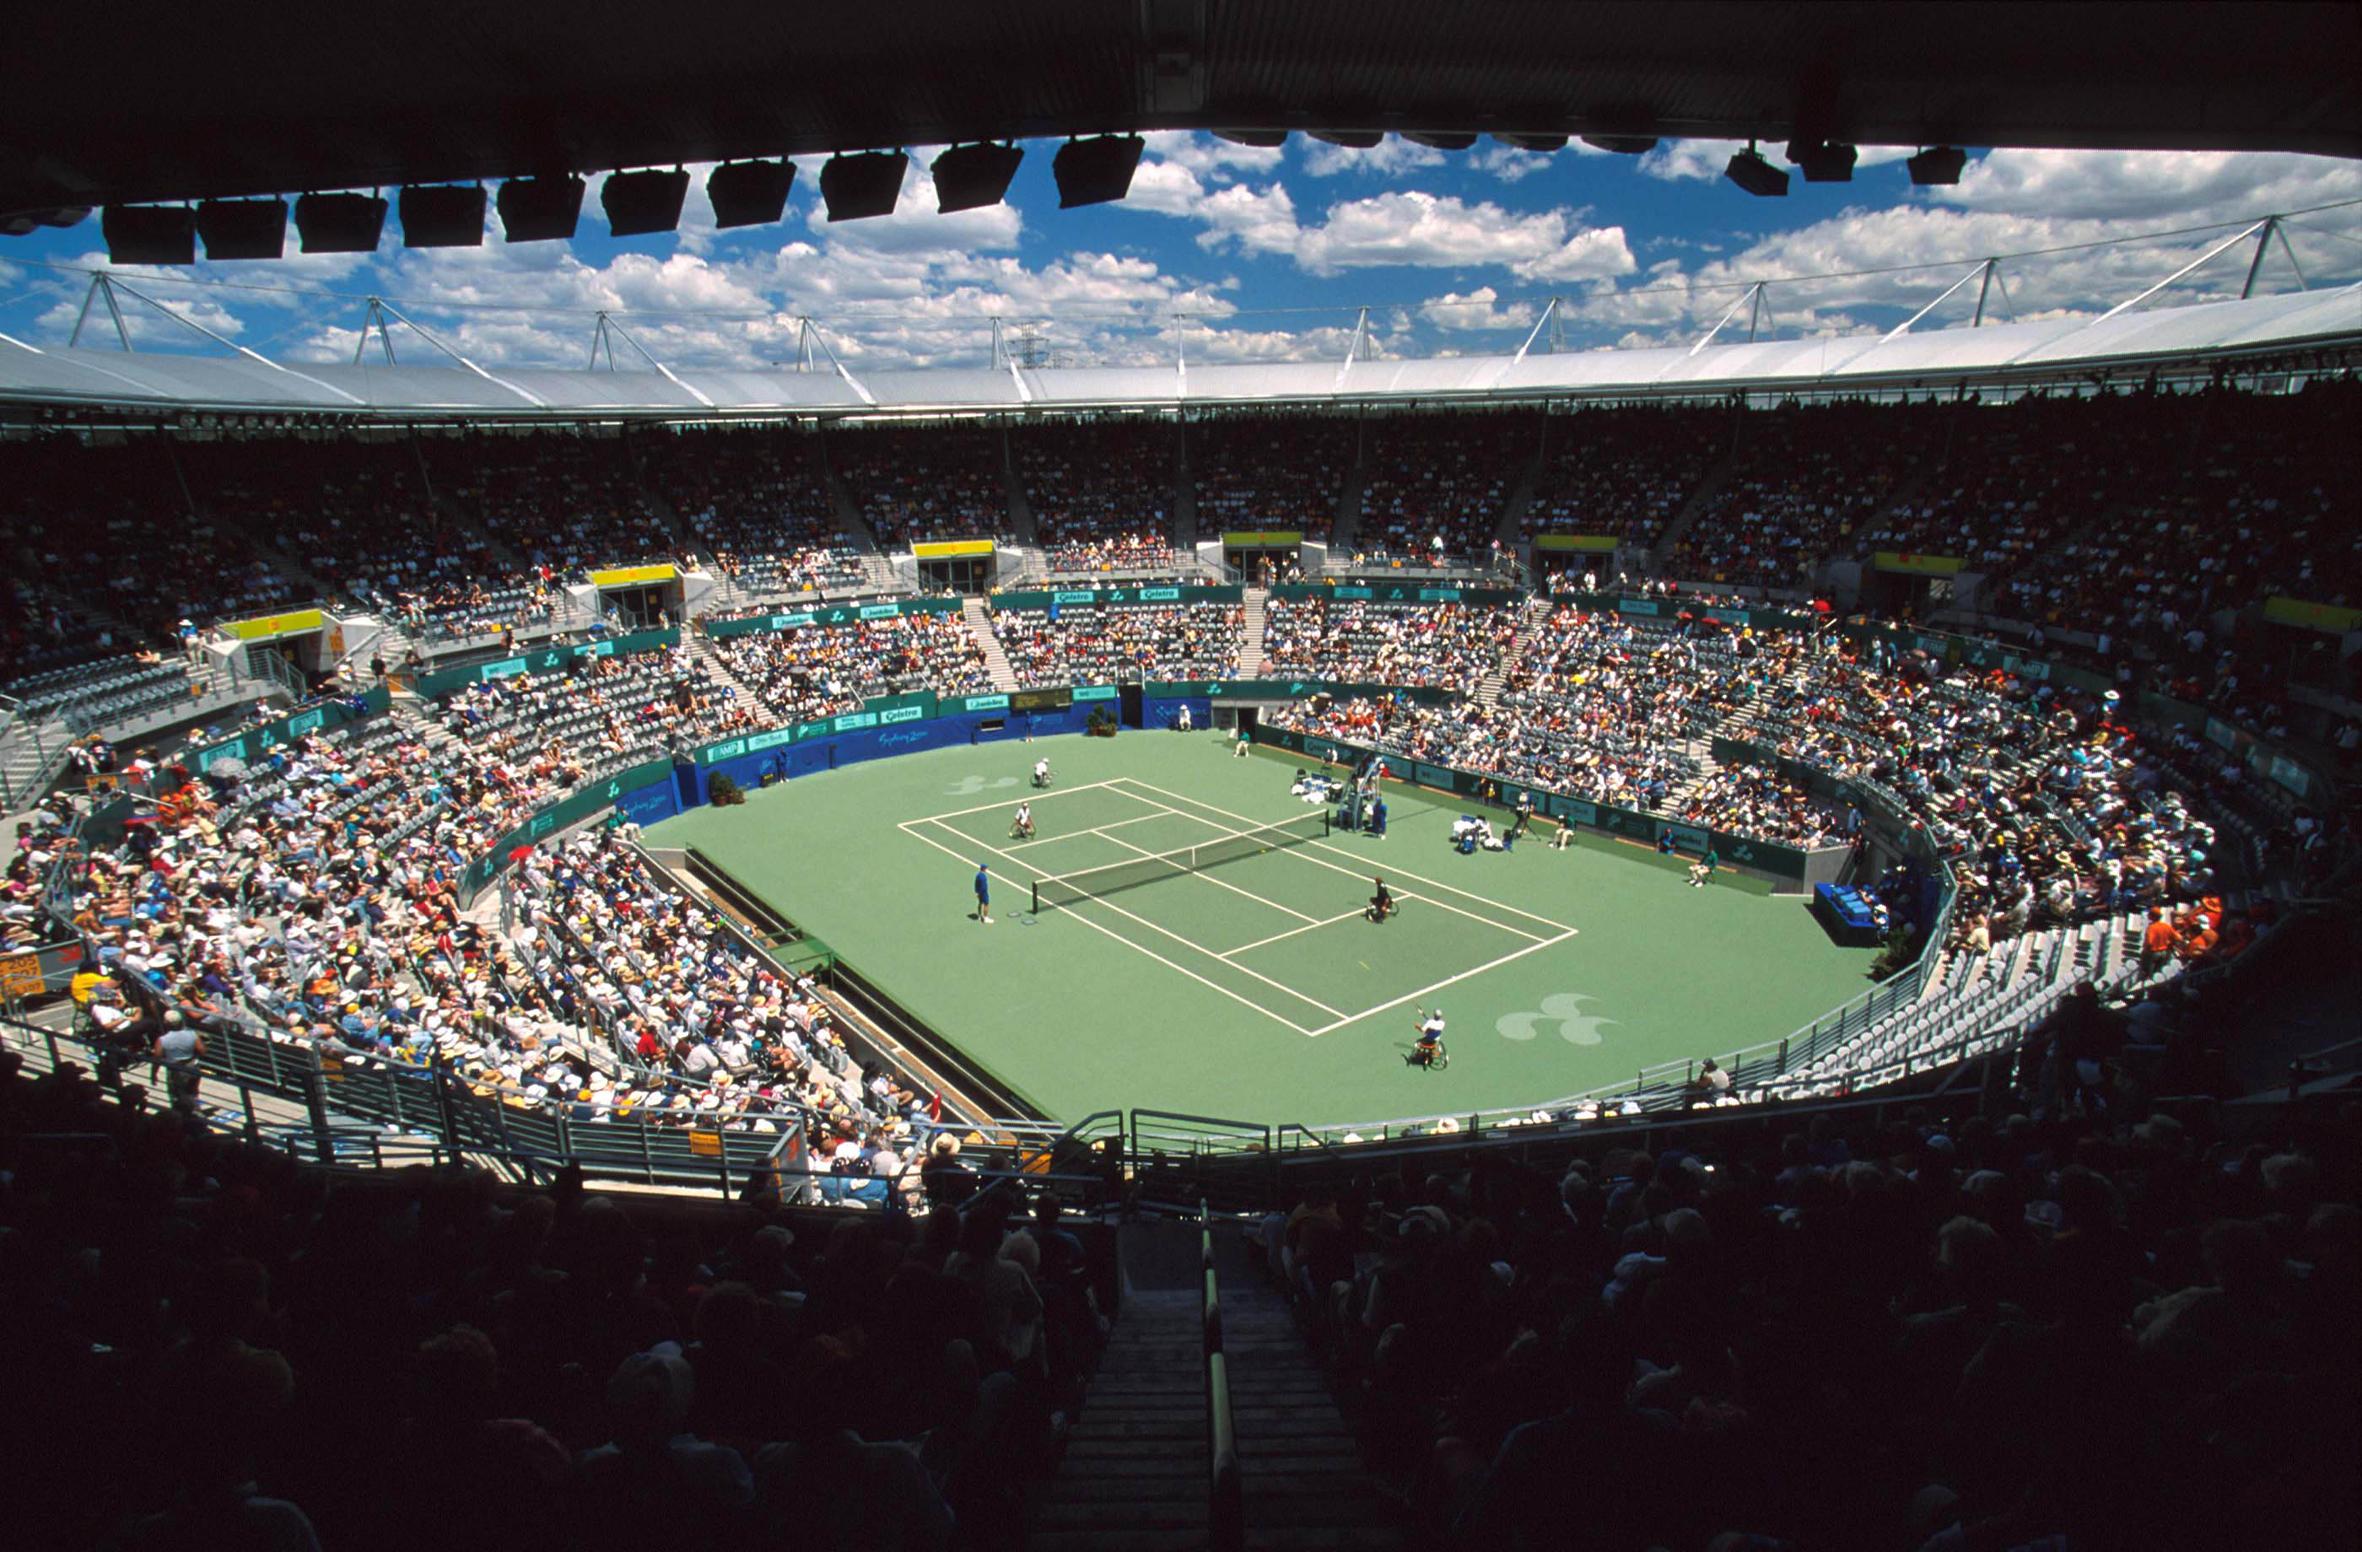 tennis sydney - photo #7